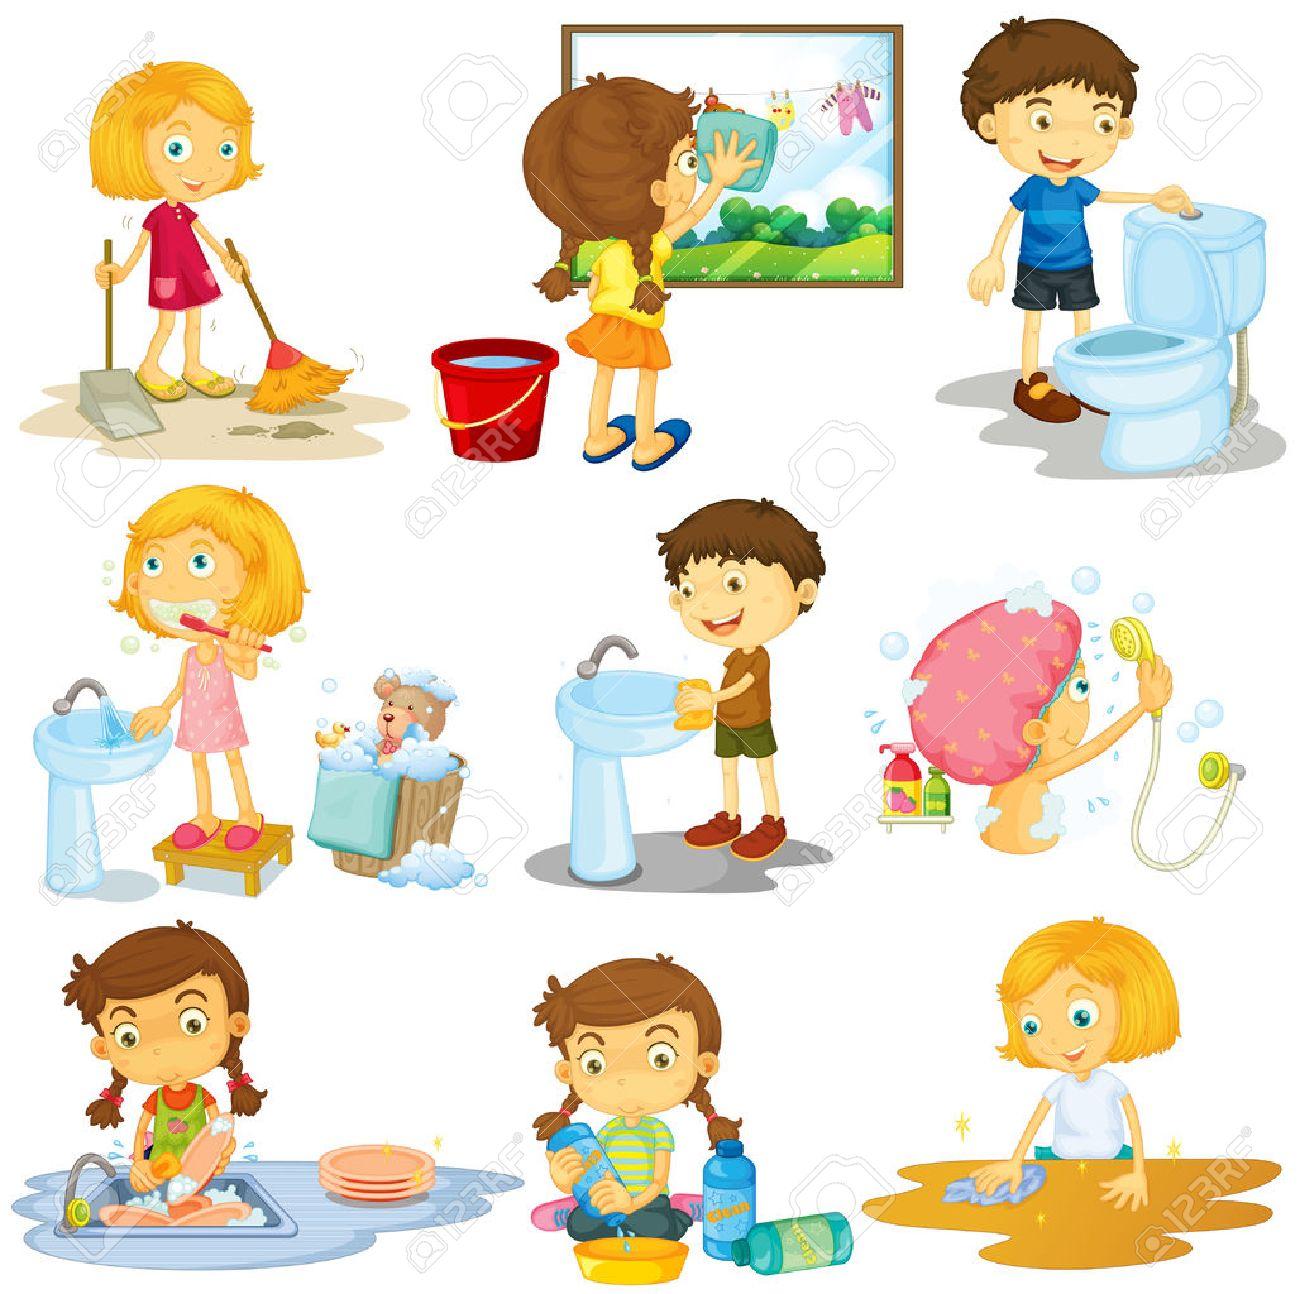 hight resolution of children doing different chores illustration stock vector 52044791